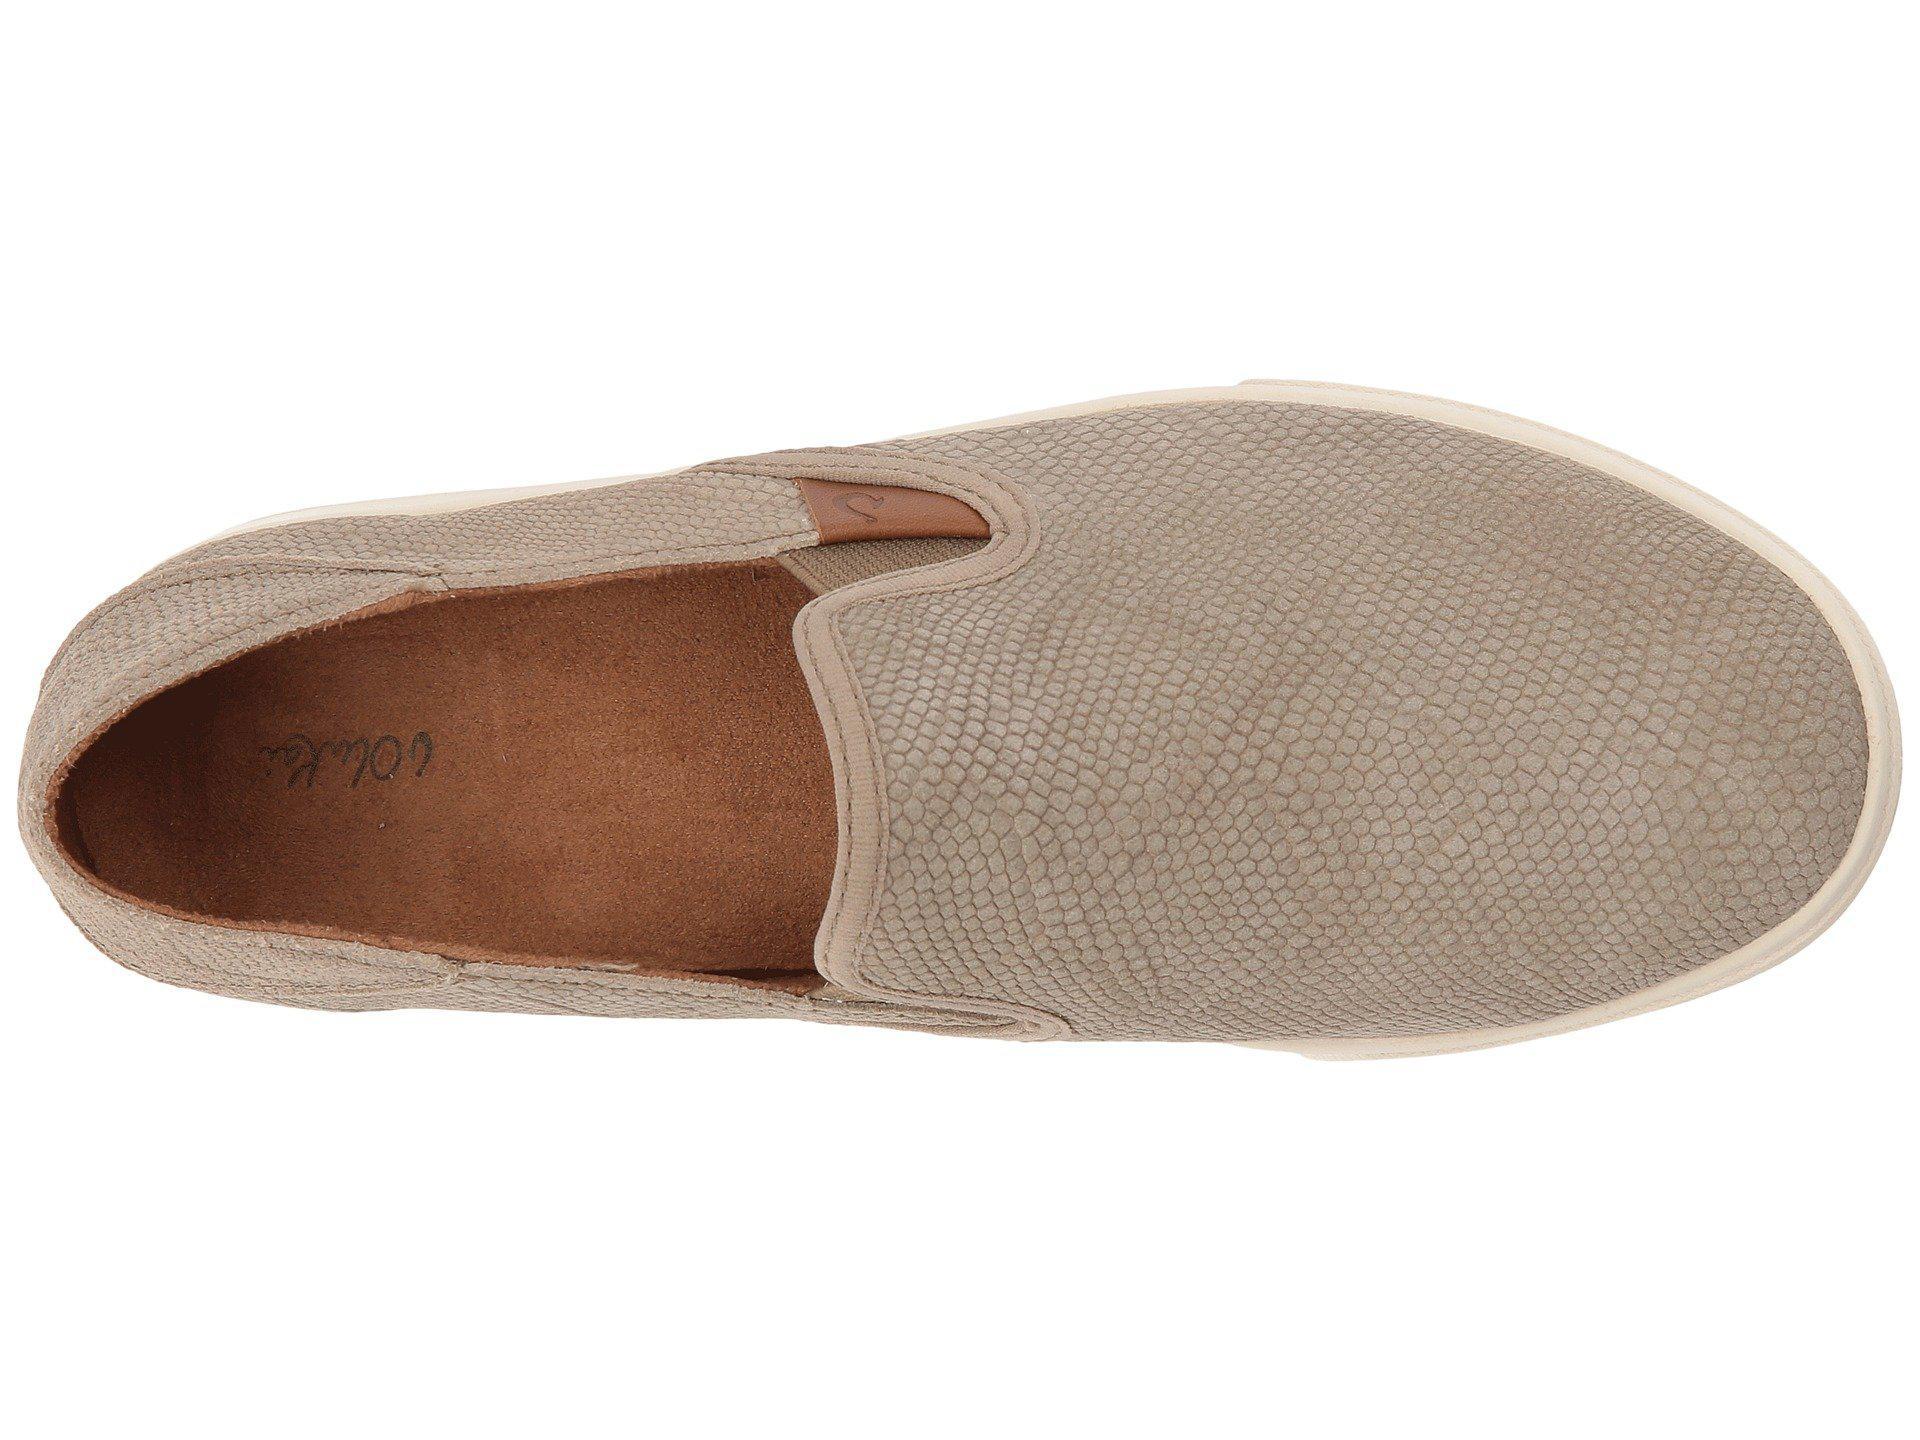 019c96ff2b68 Olukai - Multicolor Pehuea Leather (black black) Women s Shoes - Lyst. View  fullscreen